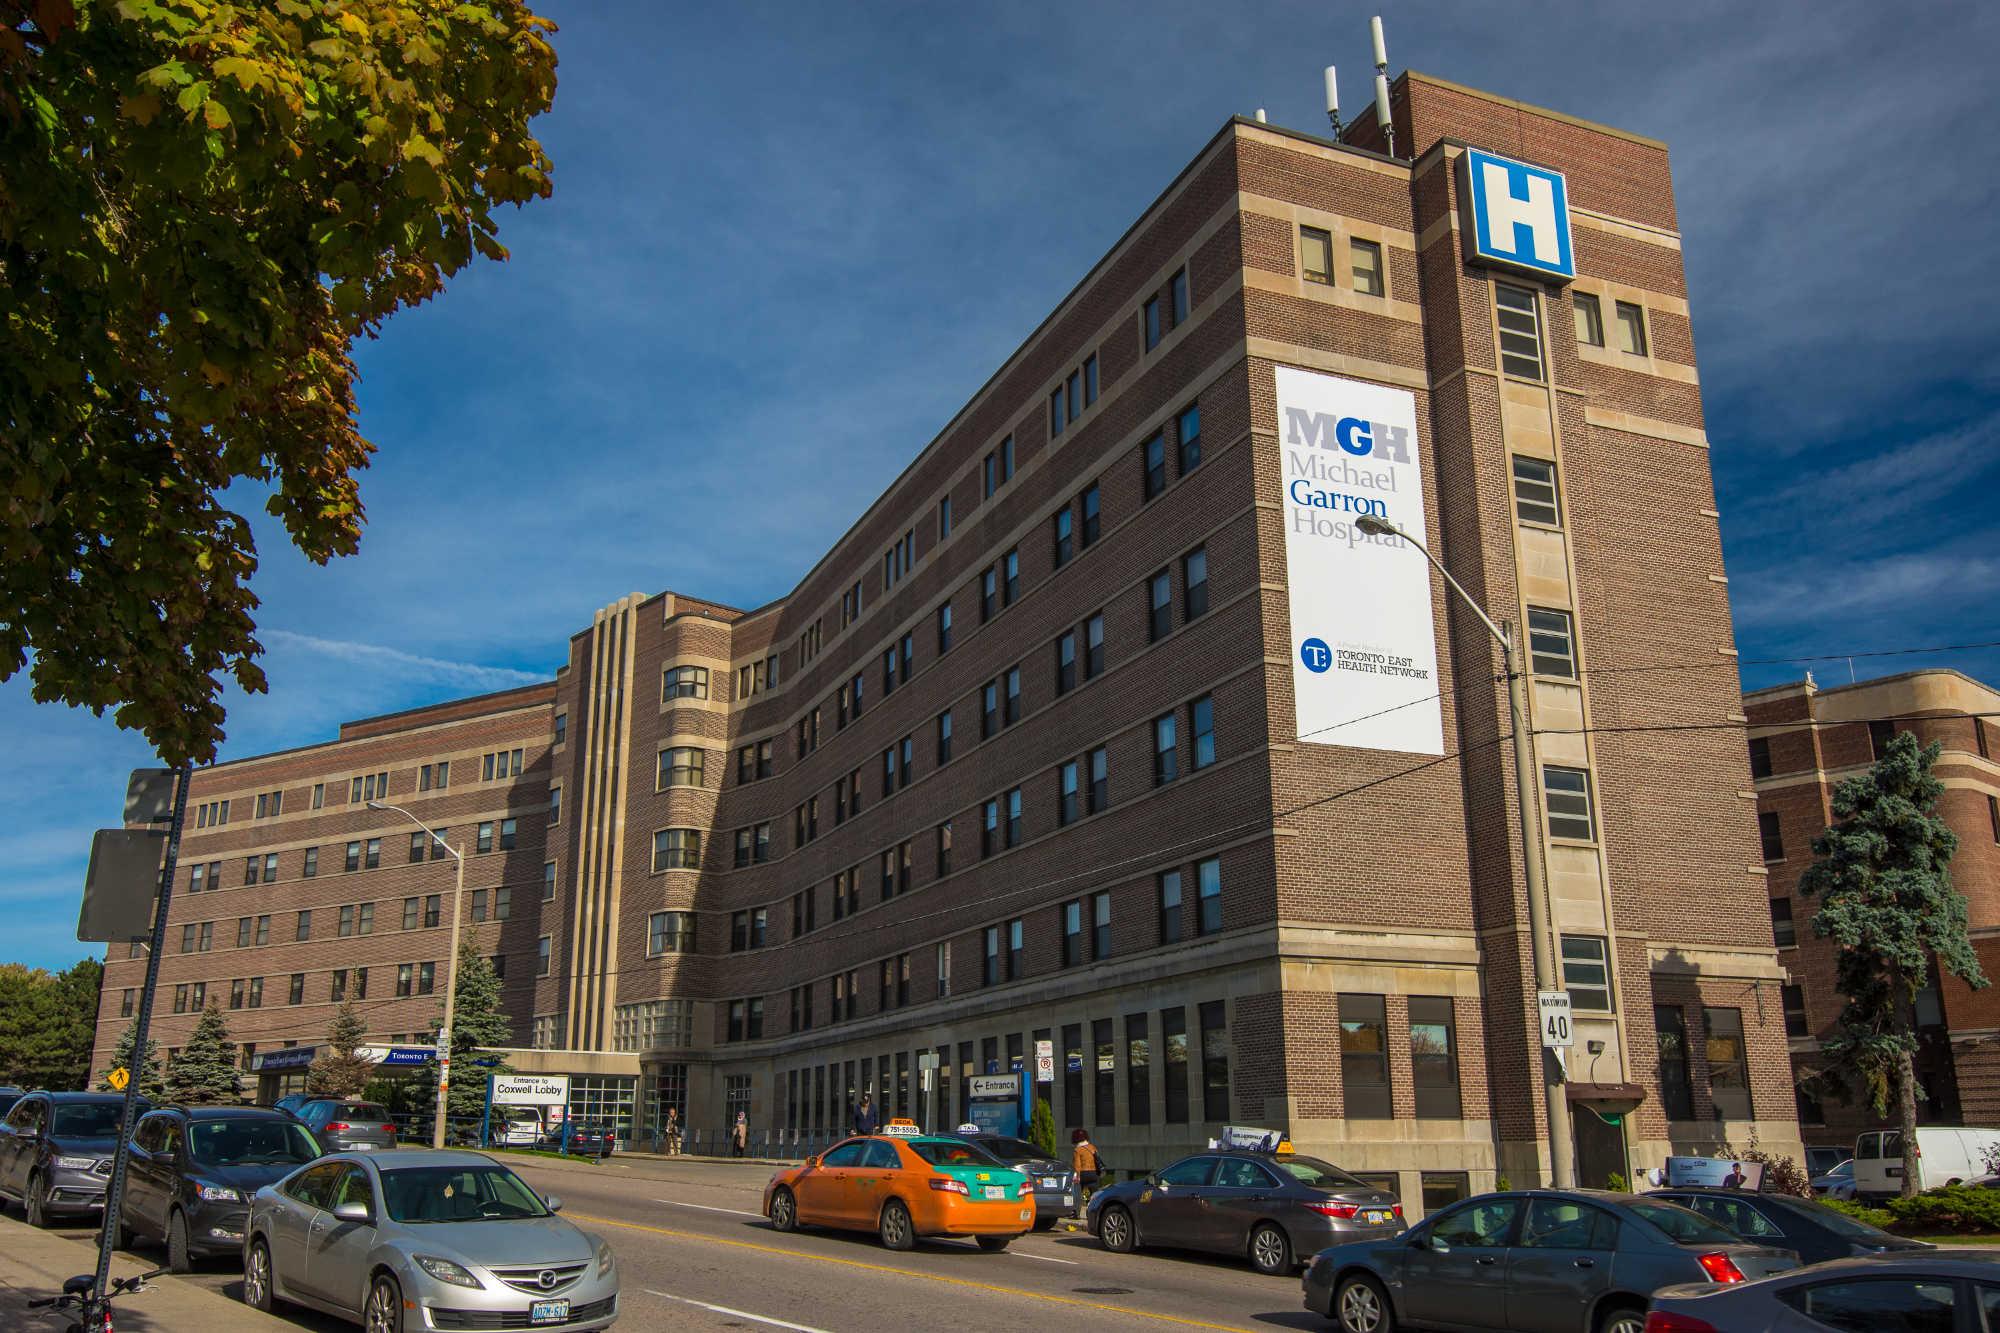 toronto east general hospital -825 Coxwell Ave